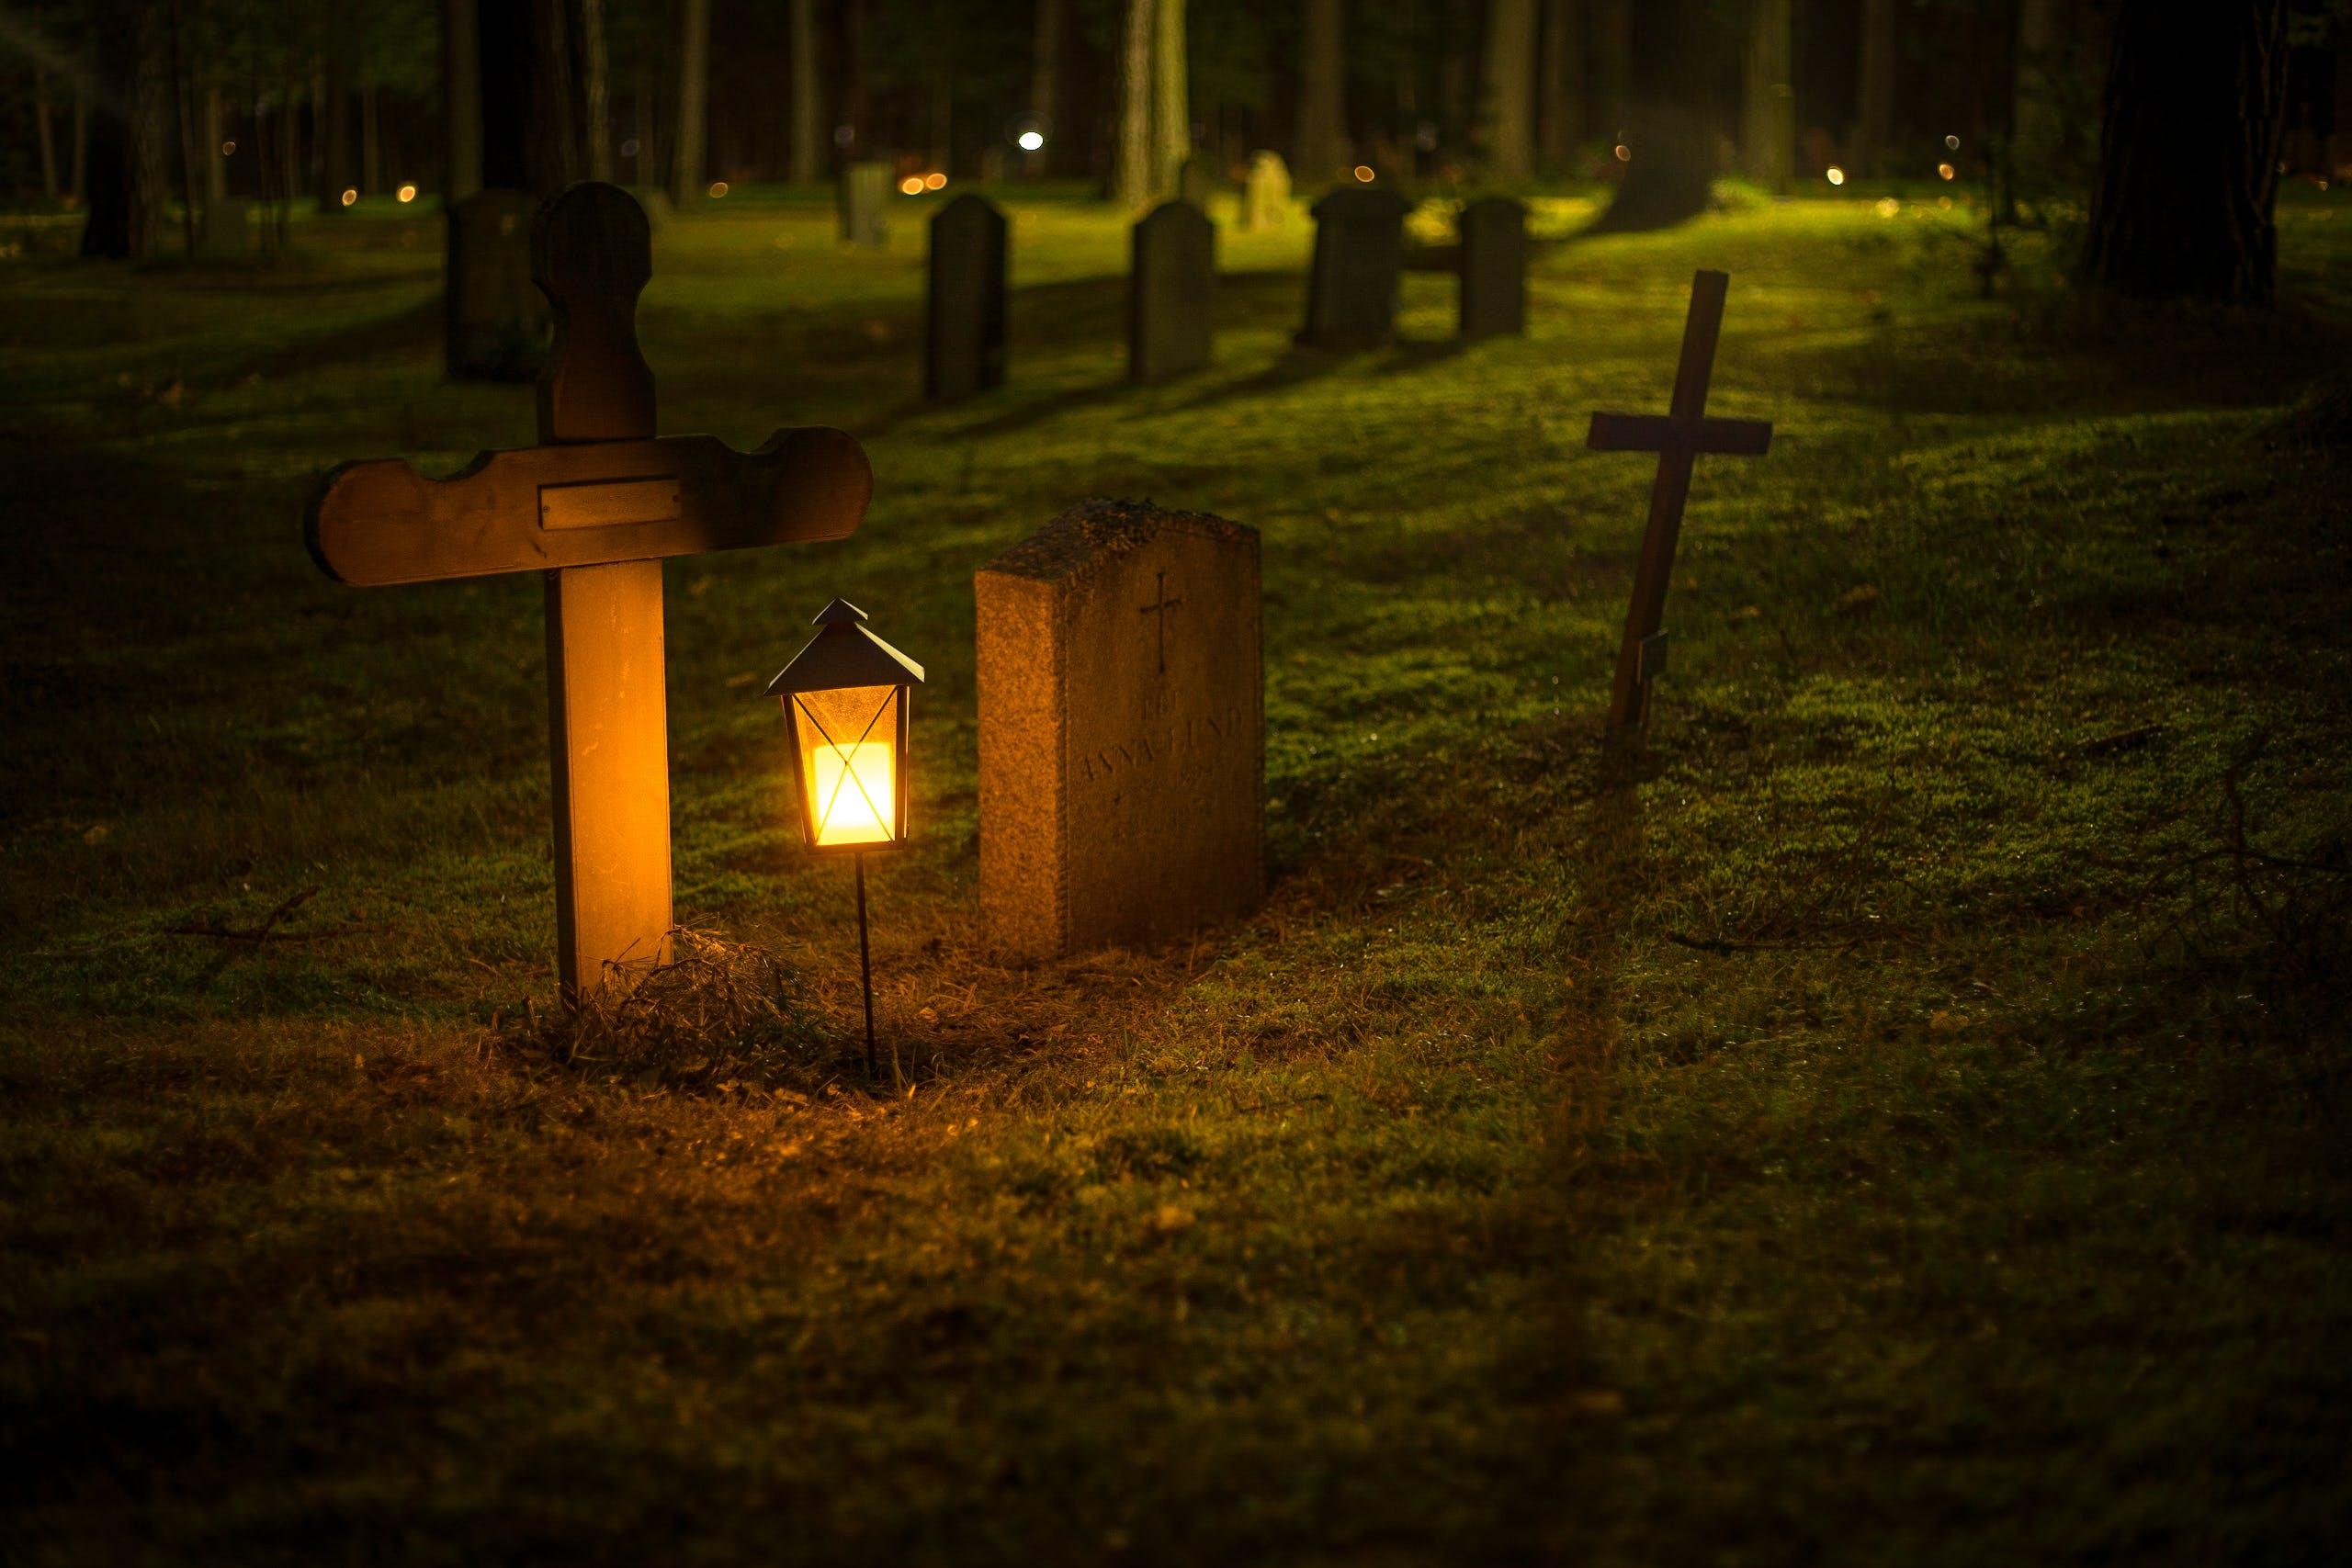 Selective Focus Photo of Cemetery Lantern